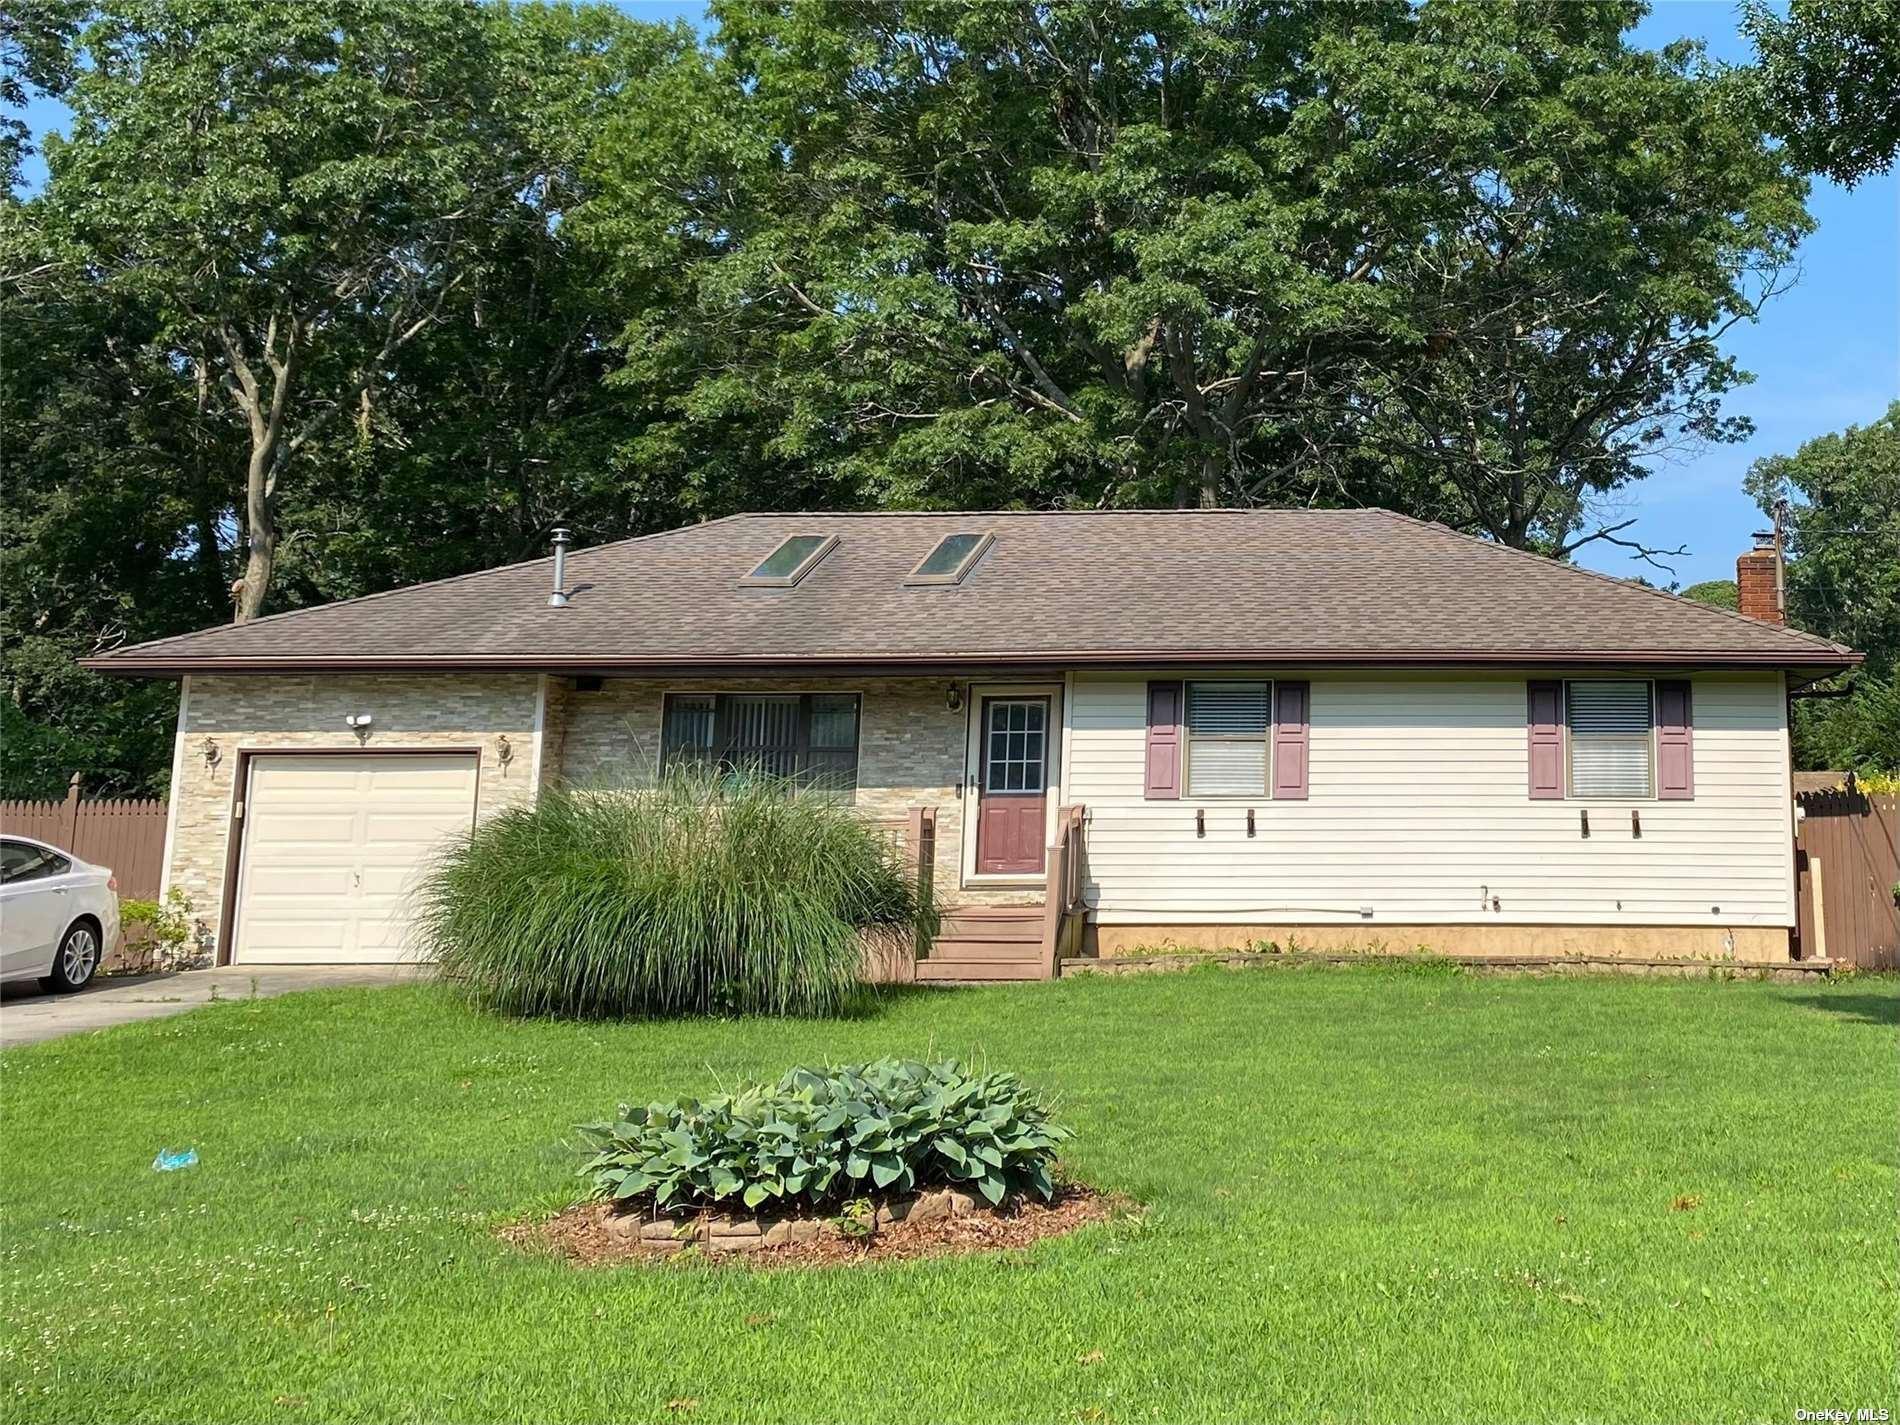 399 Birch Hollow Drive, Shirley, NY 11967 - MLS#: 3330272